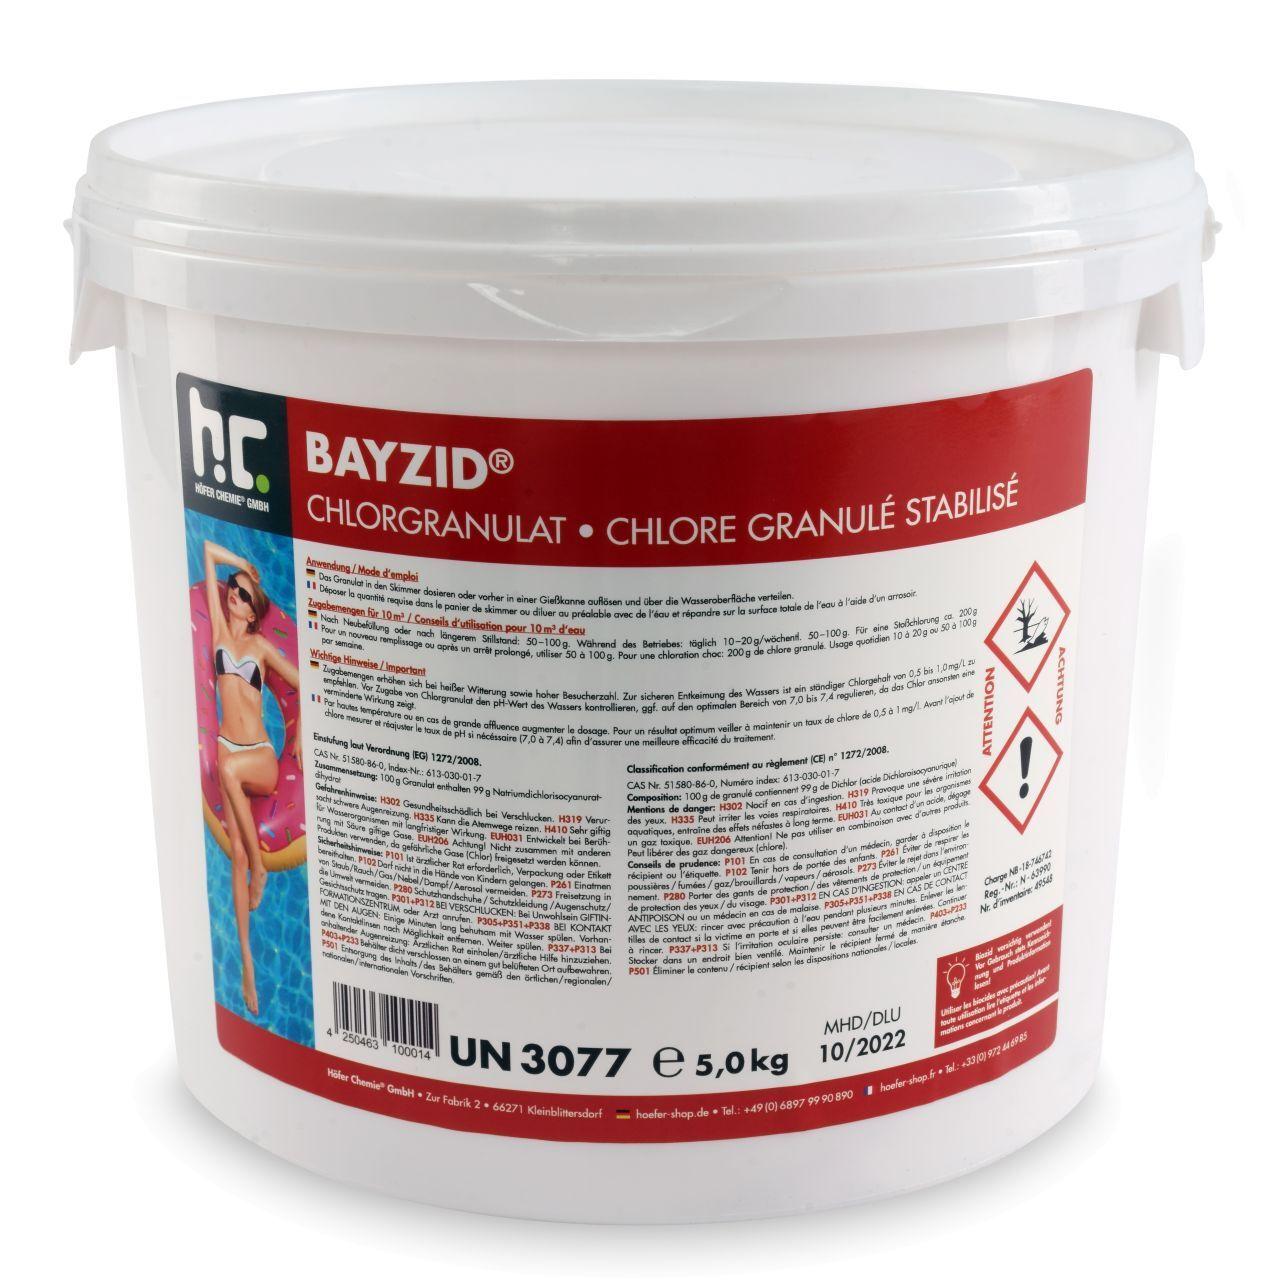 BAYZID 5 kg Bayzid® Granulé de chlore choc (1 x 5 kg)